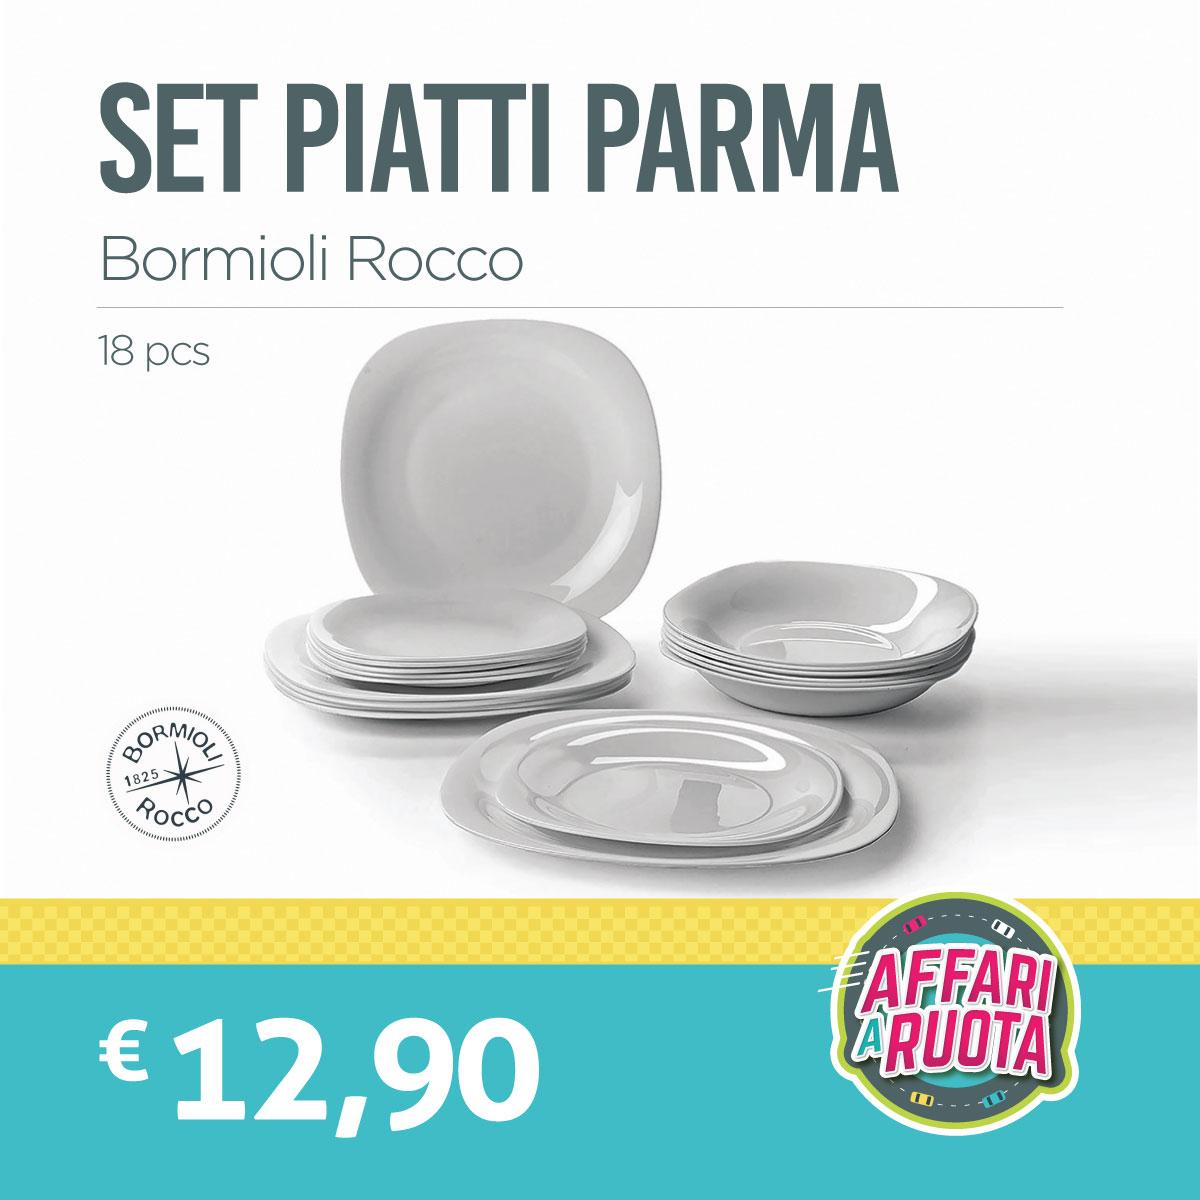 Set piatti Parma Bormioli Rocco